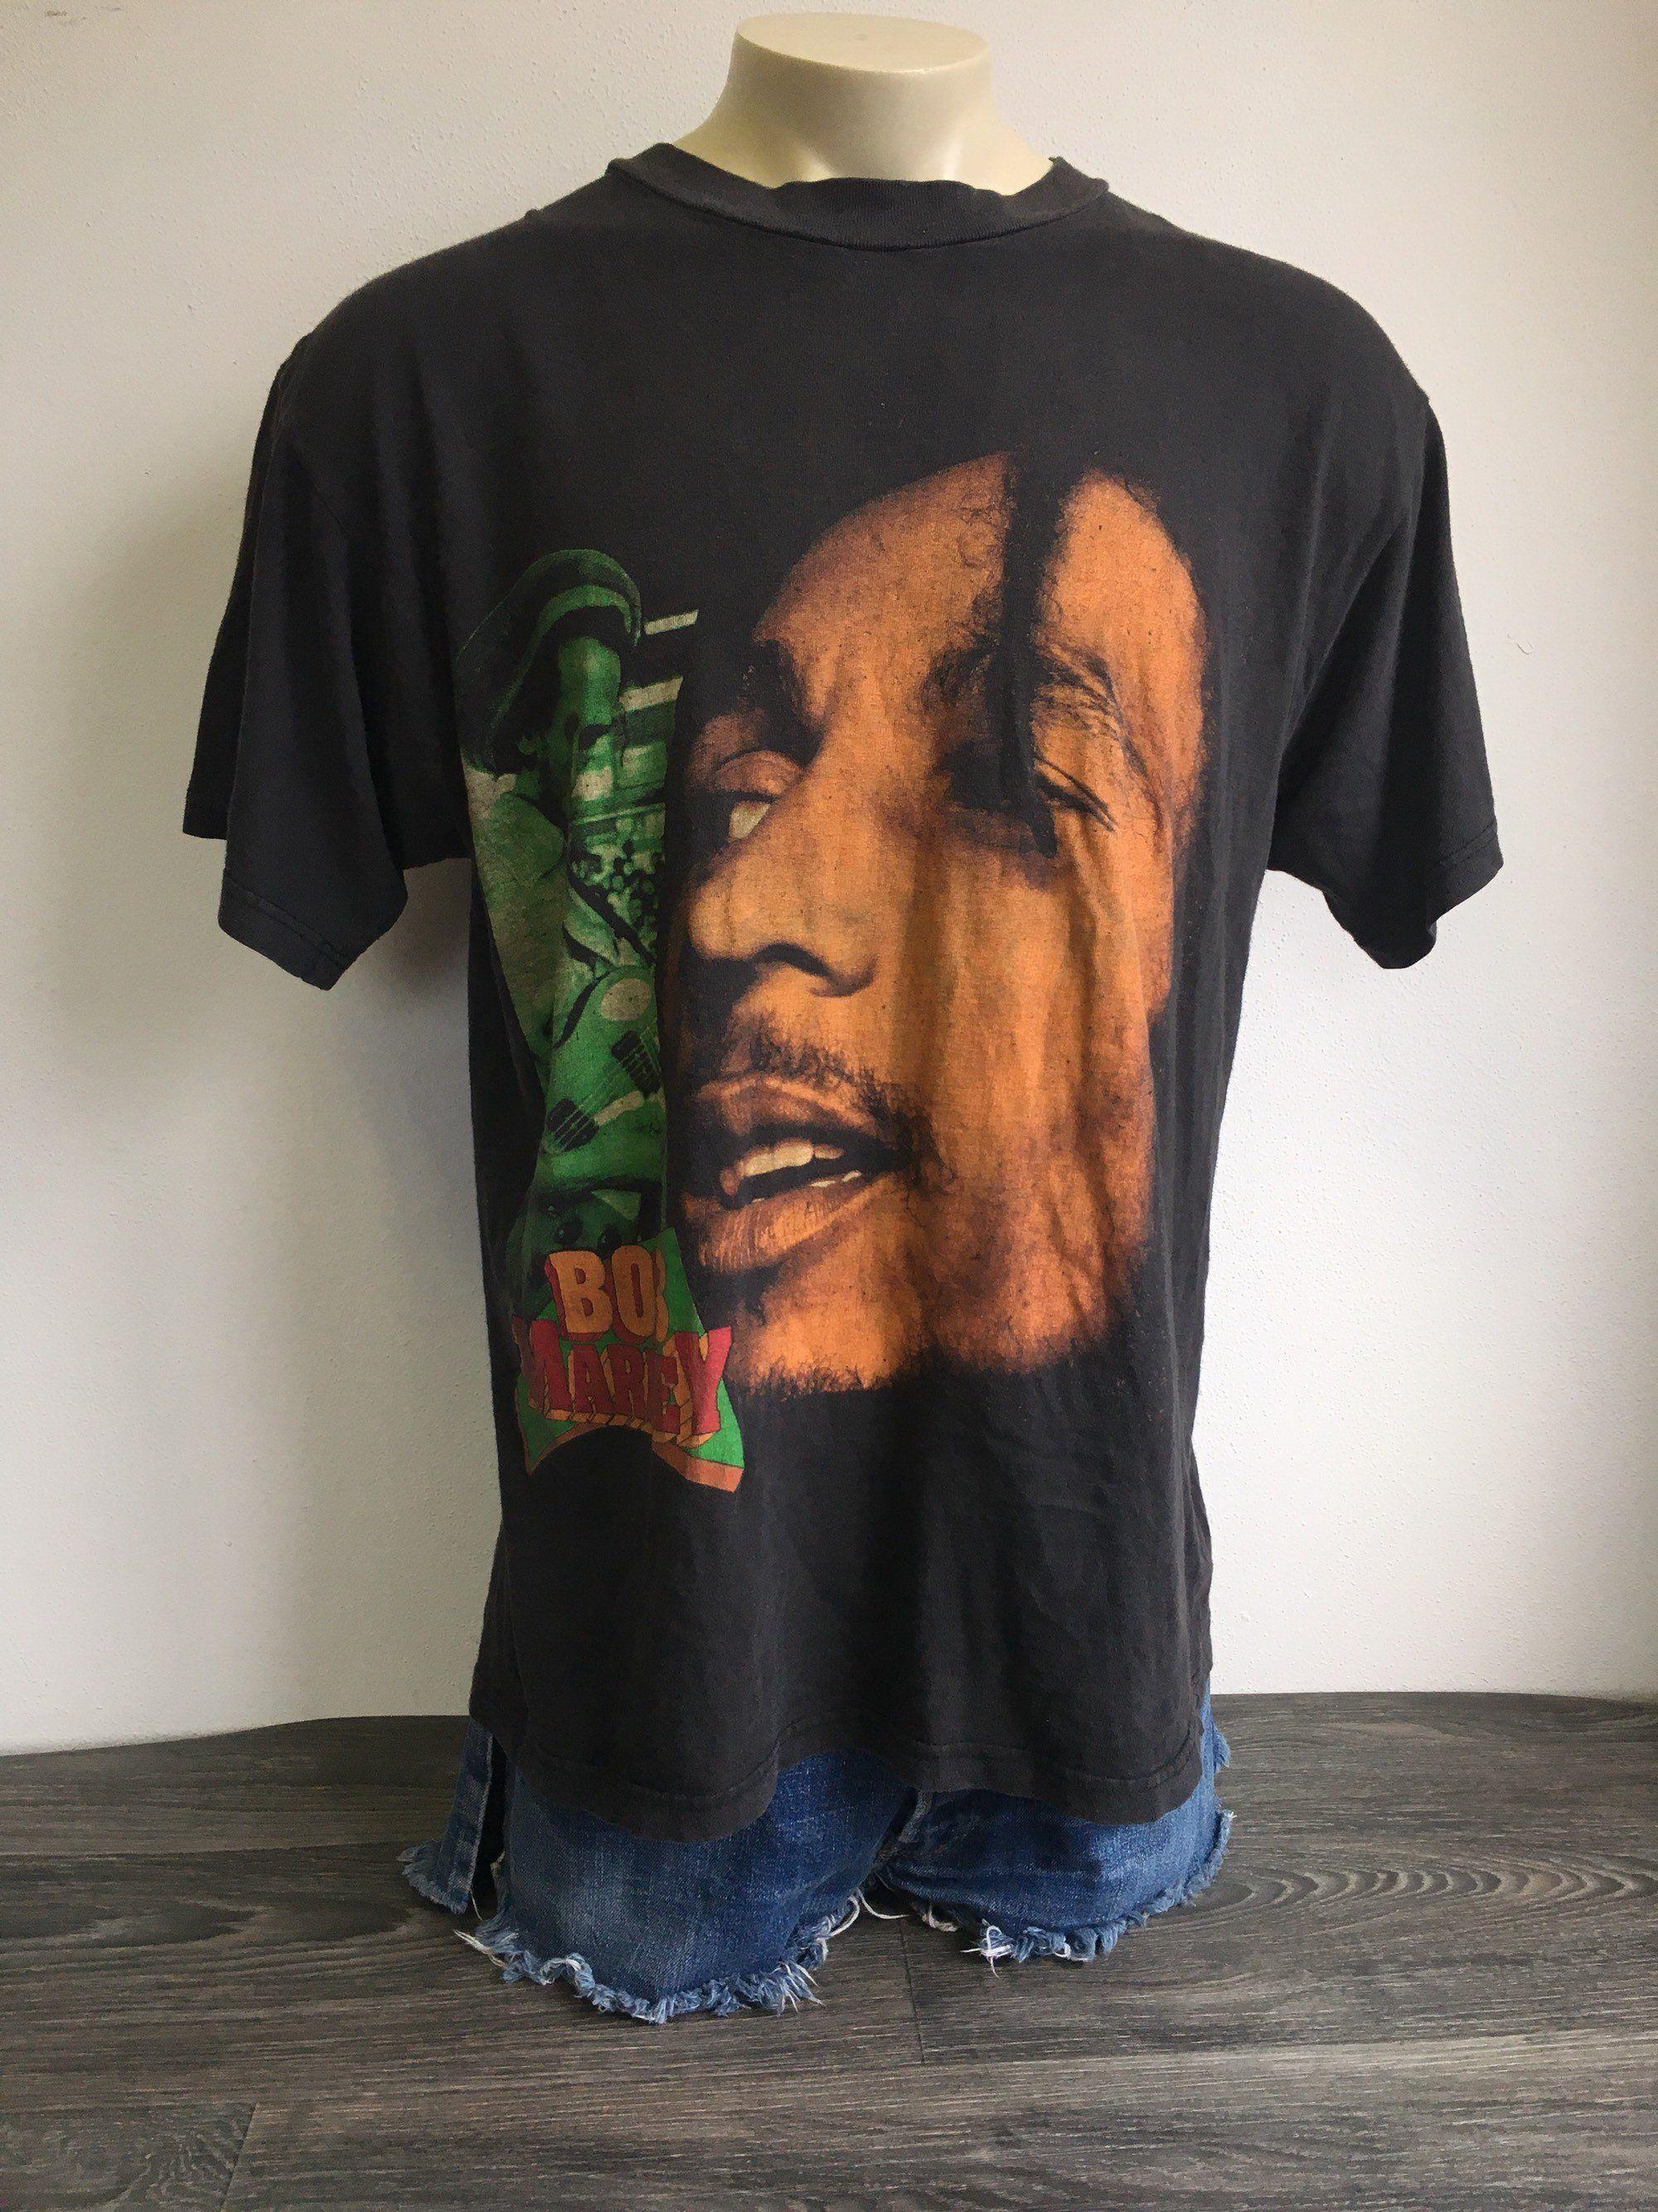 Vintage BOB MARLEY Shirt 90s RARE! Rap Tee Bootleg Rasta Reggae Double  Sided Tshirt No Woman No Cry Size X-Large by sweetVTGtshirt on Etsy 04dca2494